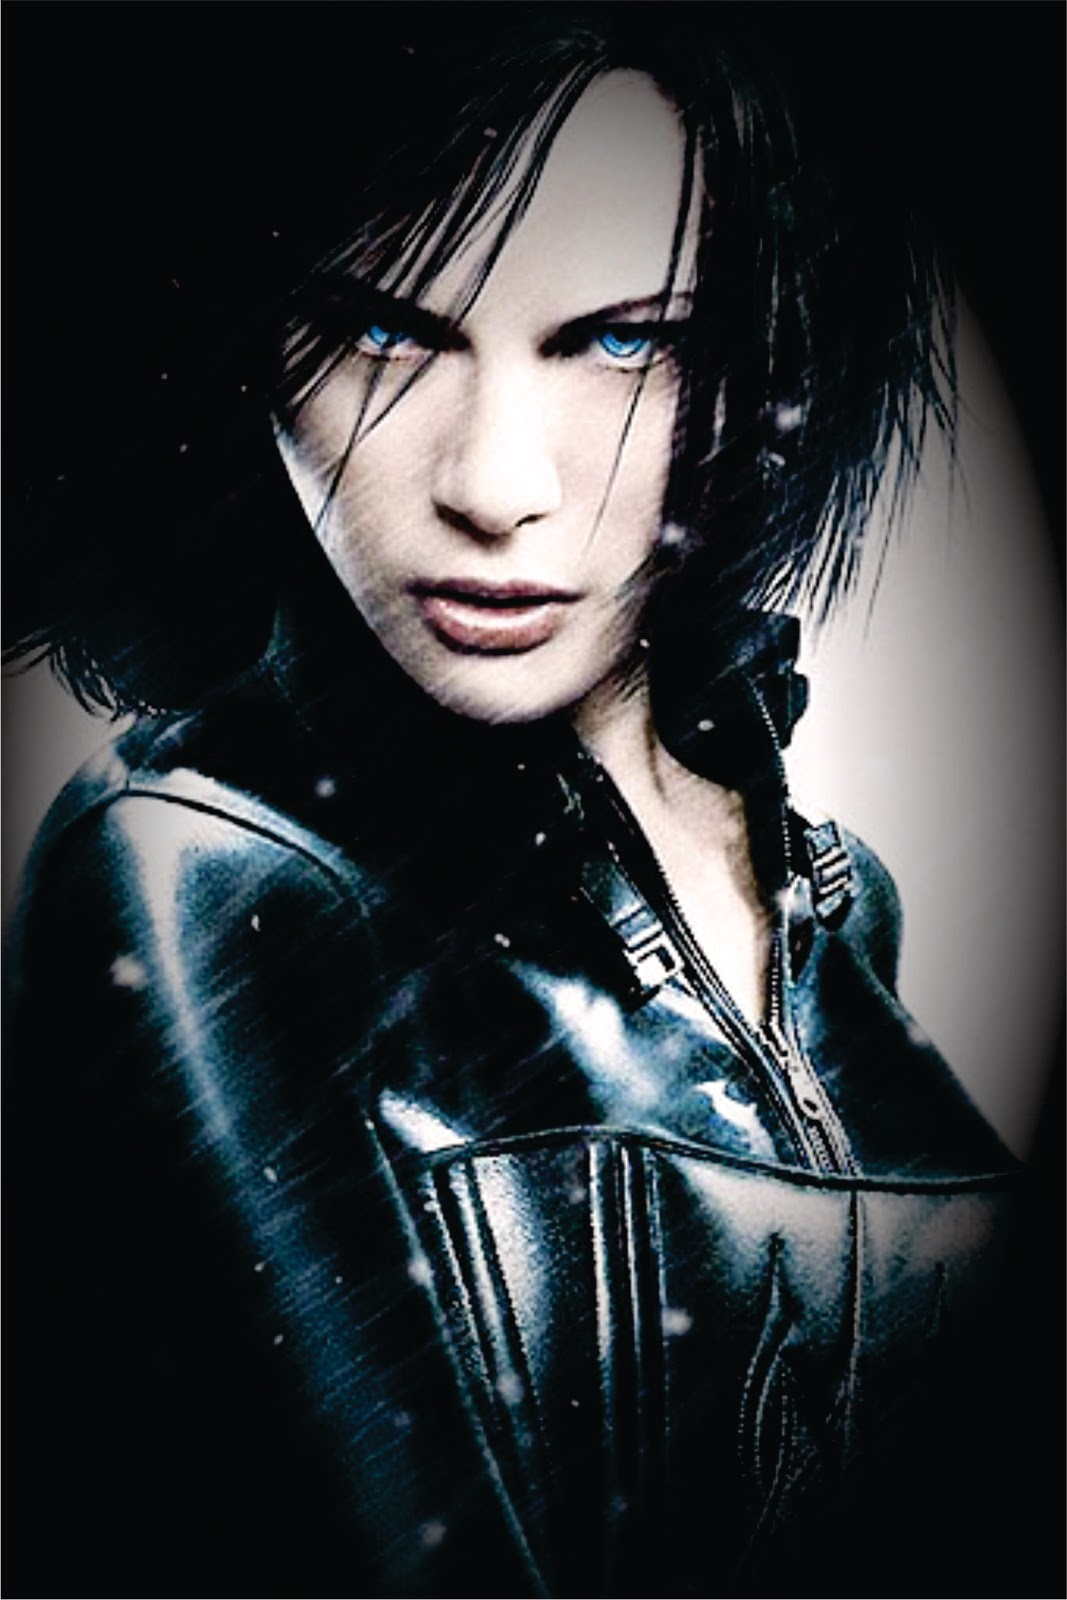 http://2.bp.blogspot.com/-grXPQ8-vRU8/TvGeTfATikI/AAAAAAAAHGA/Ops0OesDRA4/s1600/Kate-Beckinsale-Underworld.jpg